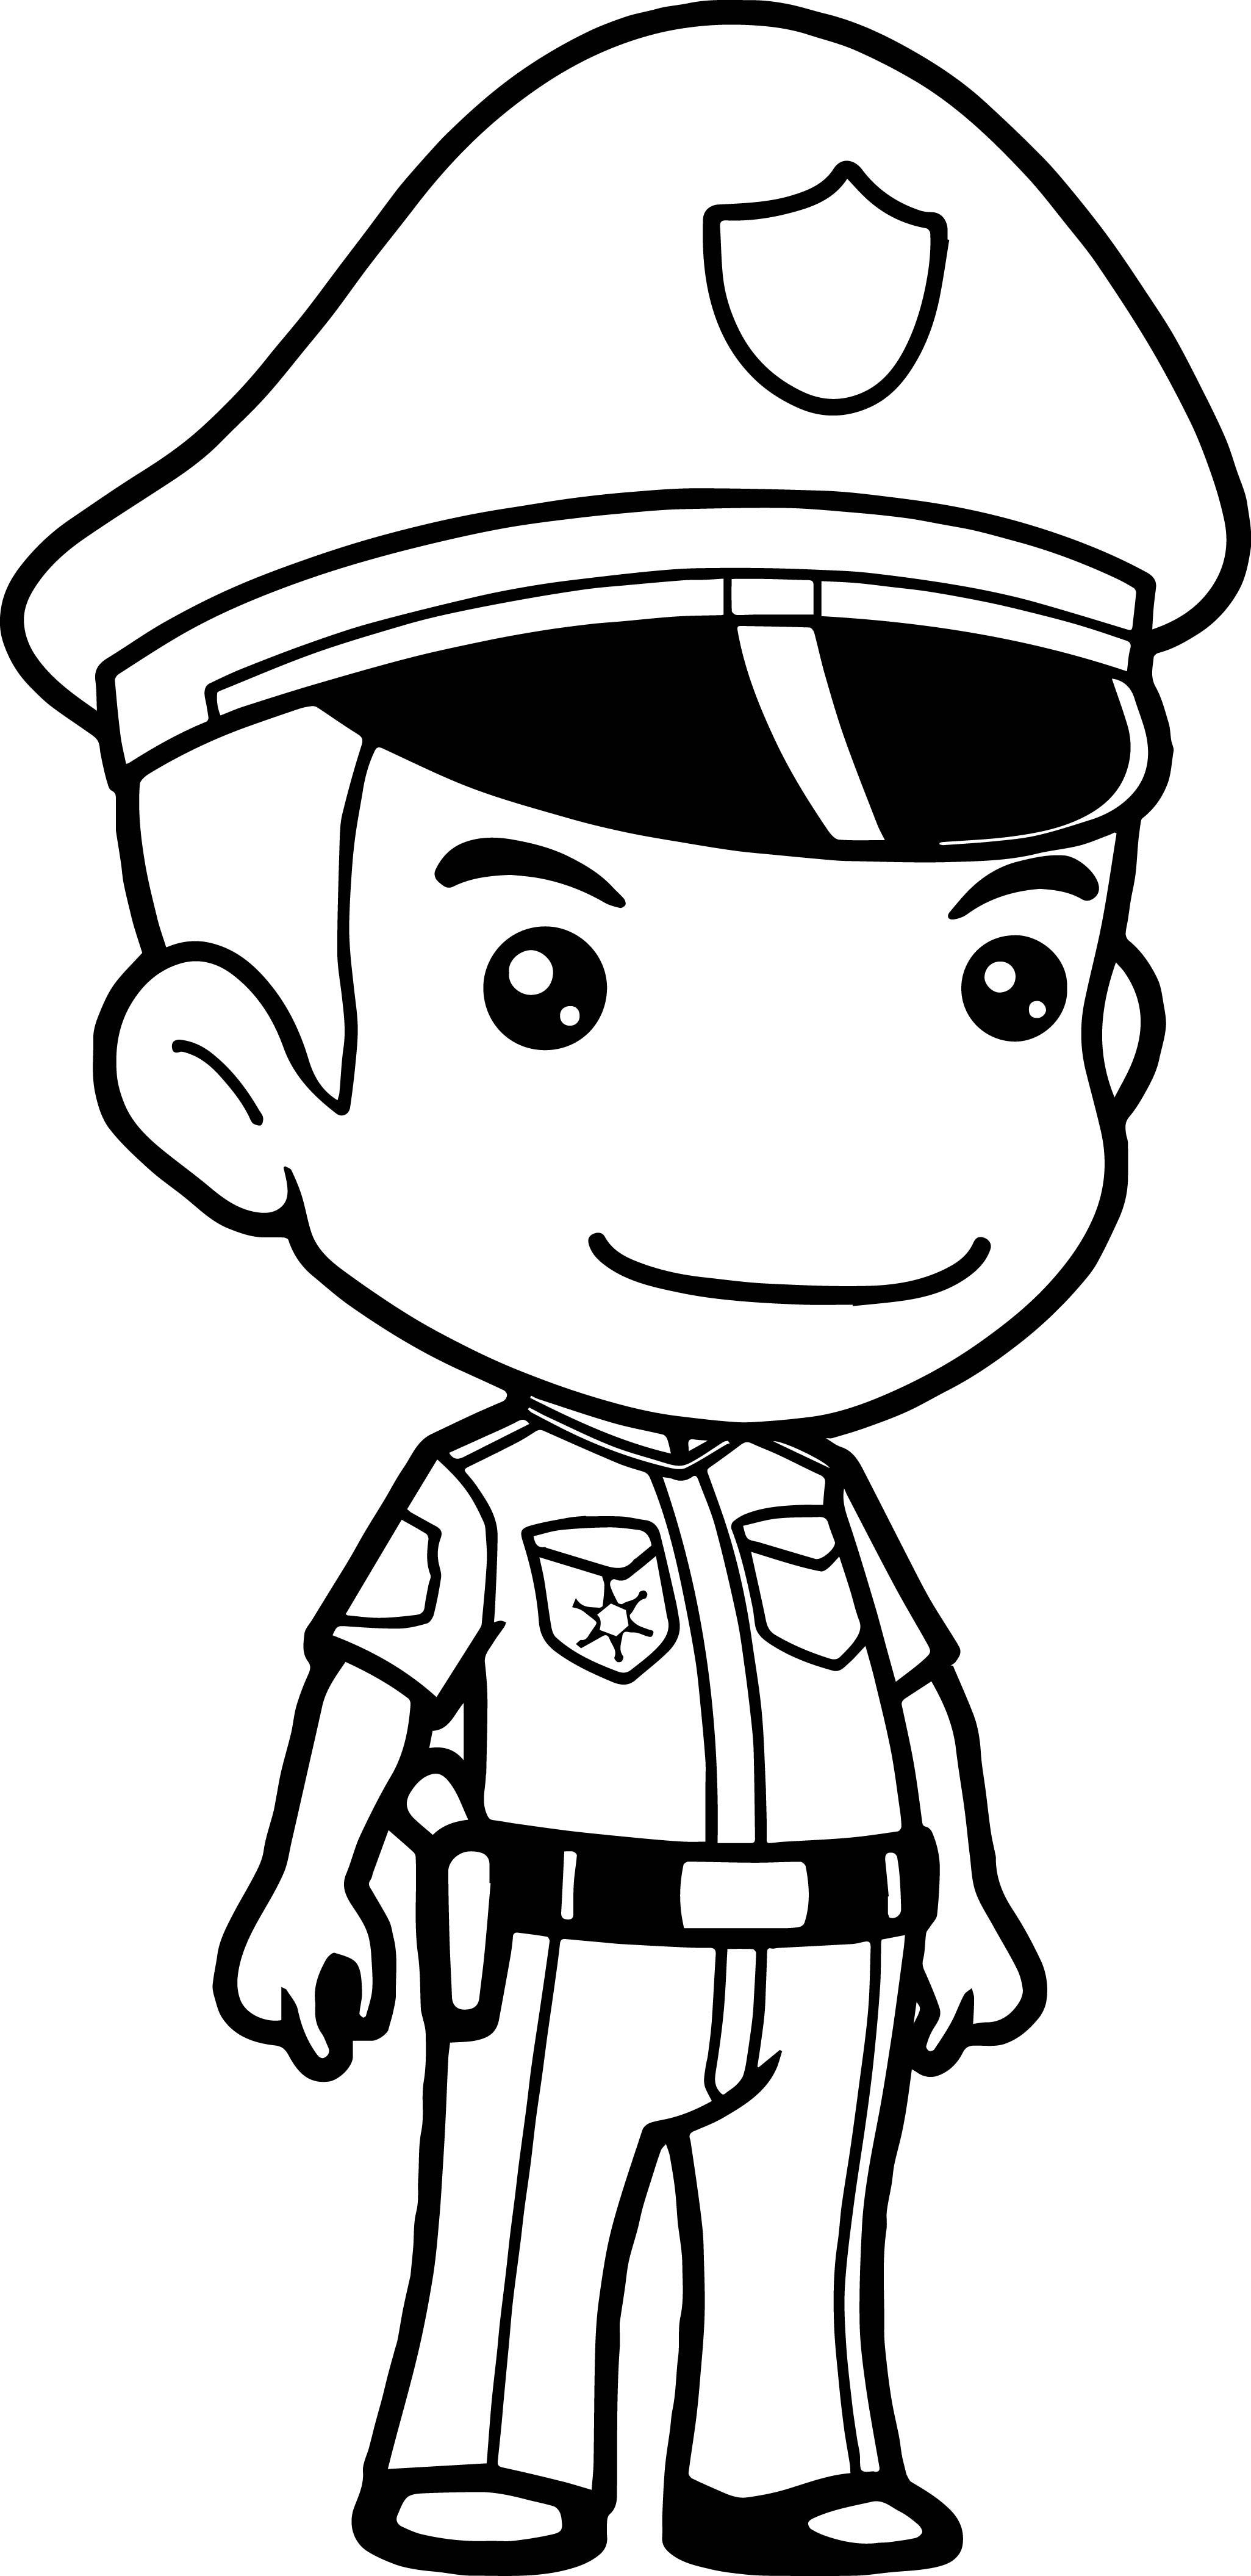 Professor And Policeman >> Anime Policeman Coloring Page | Wecoloringpage.com